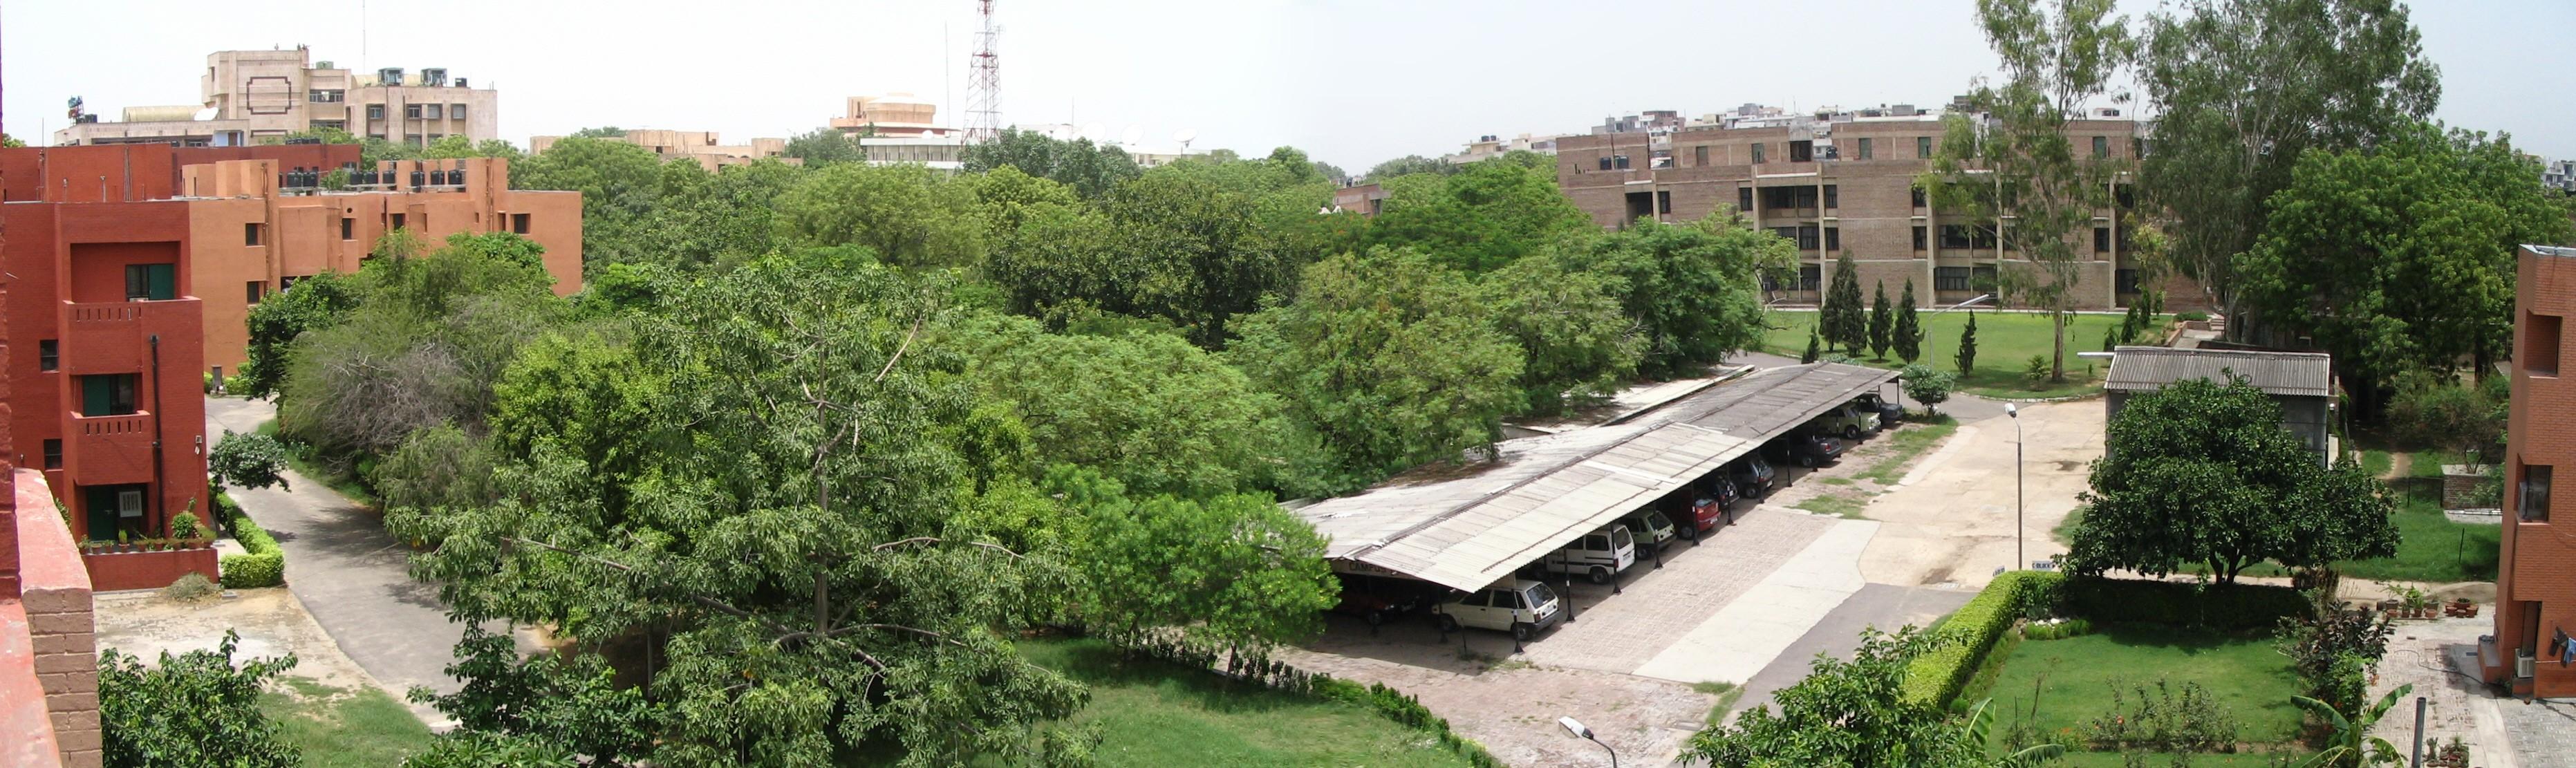 Indian Institute of Technology - Delhi (IIT Delhi Delhi Campus) Campus photos of iit delhi